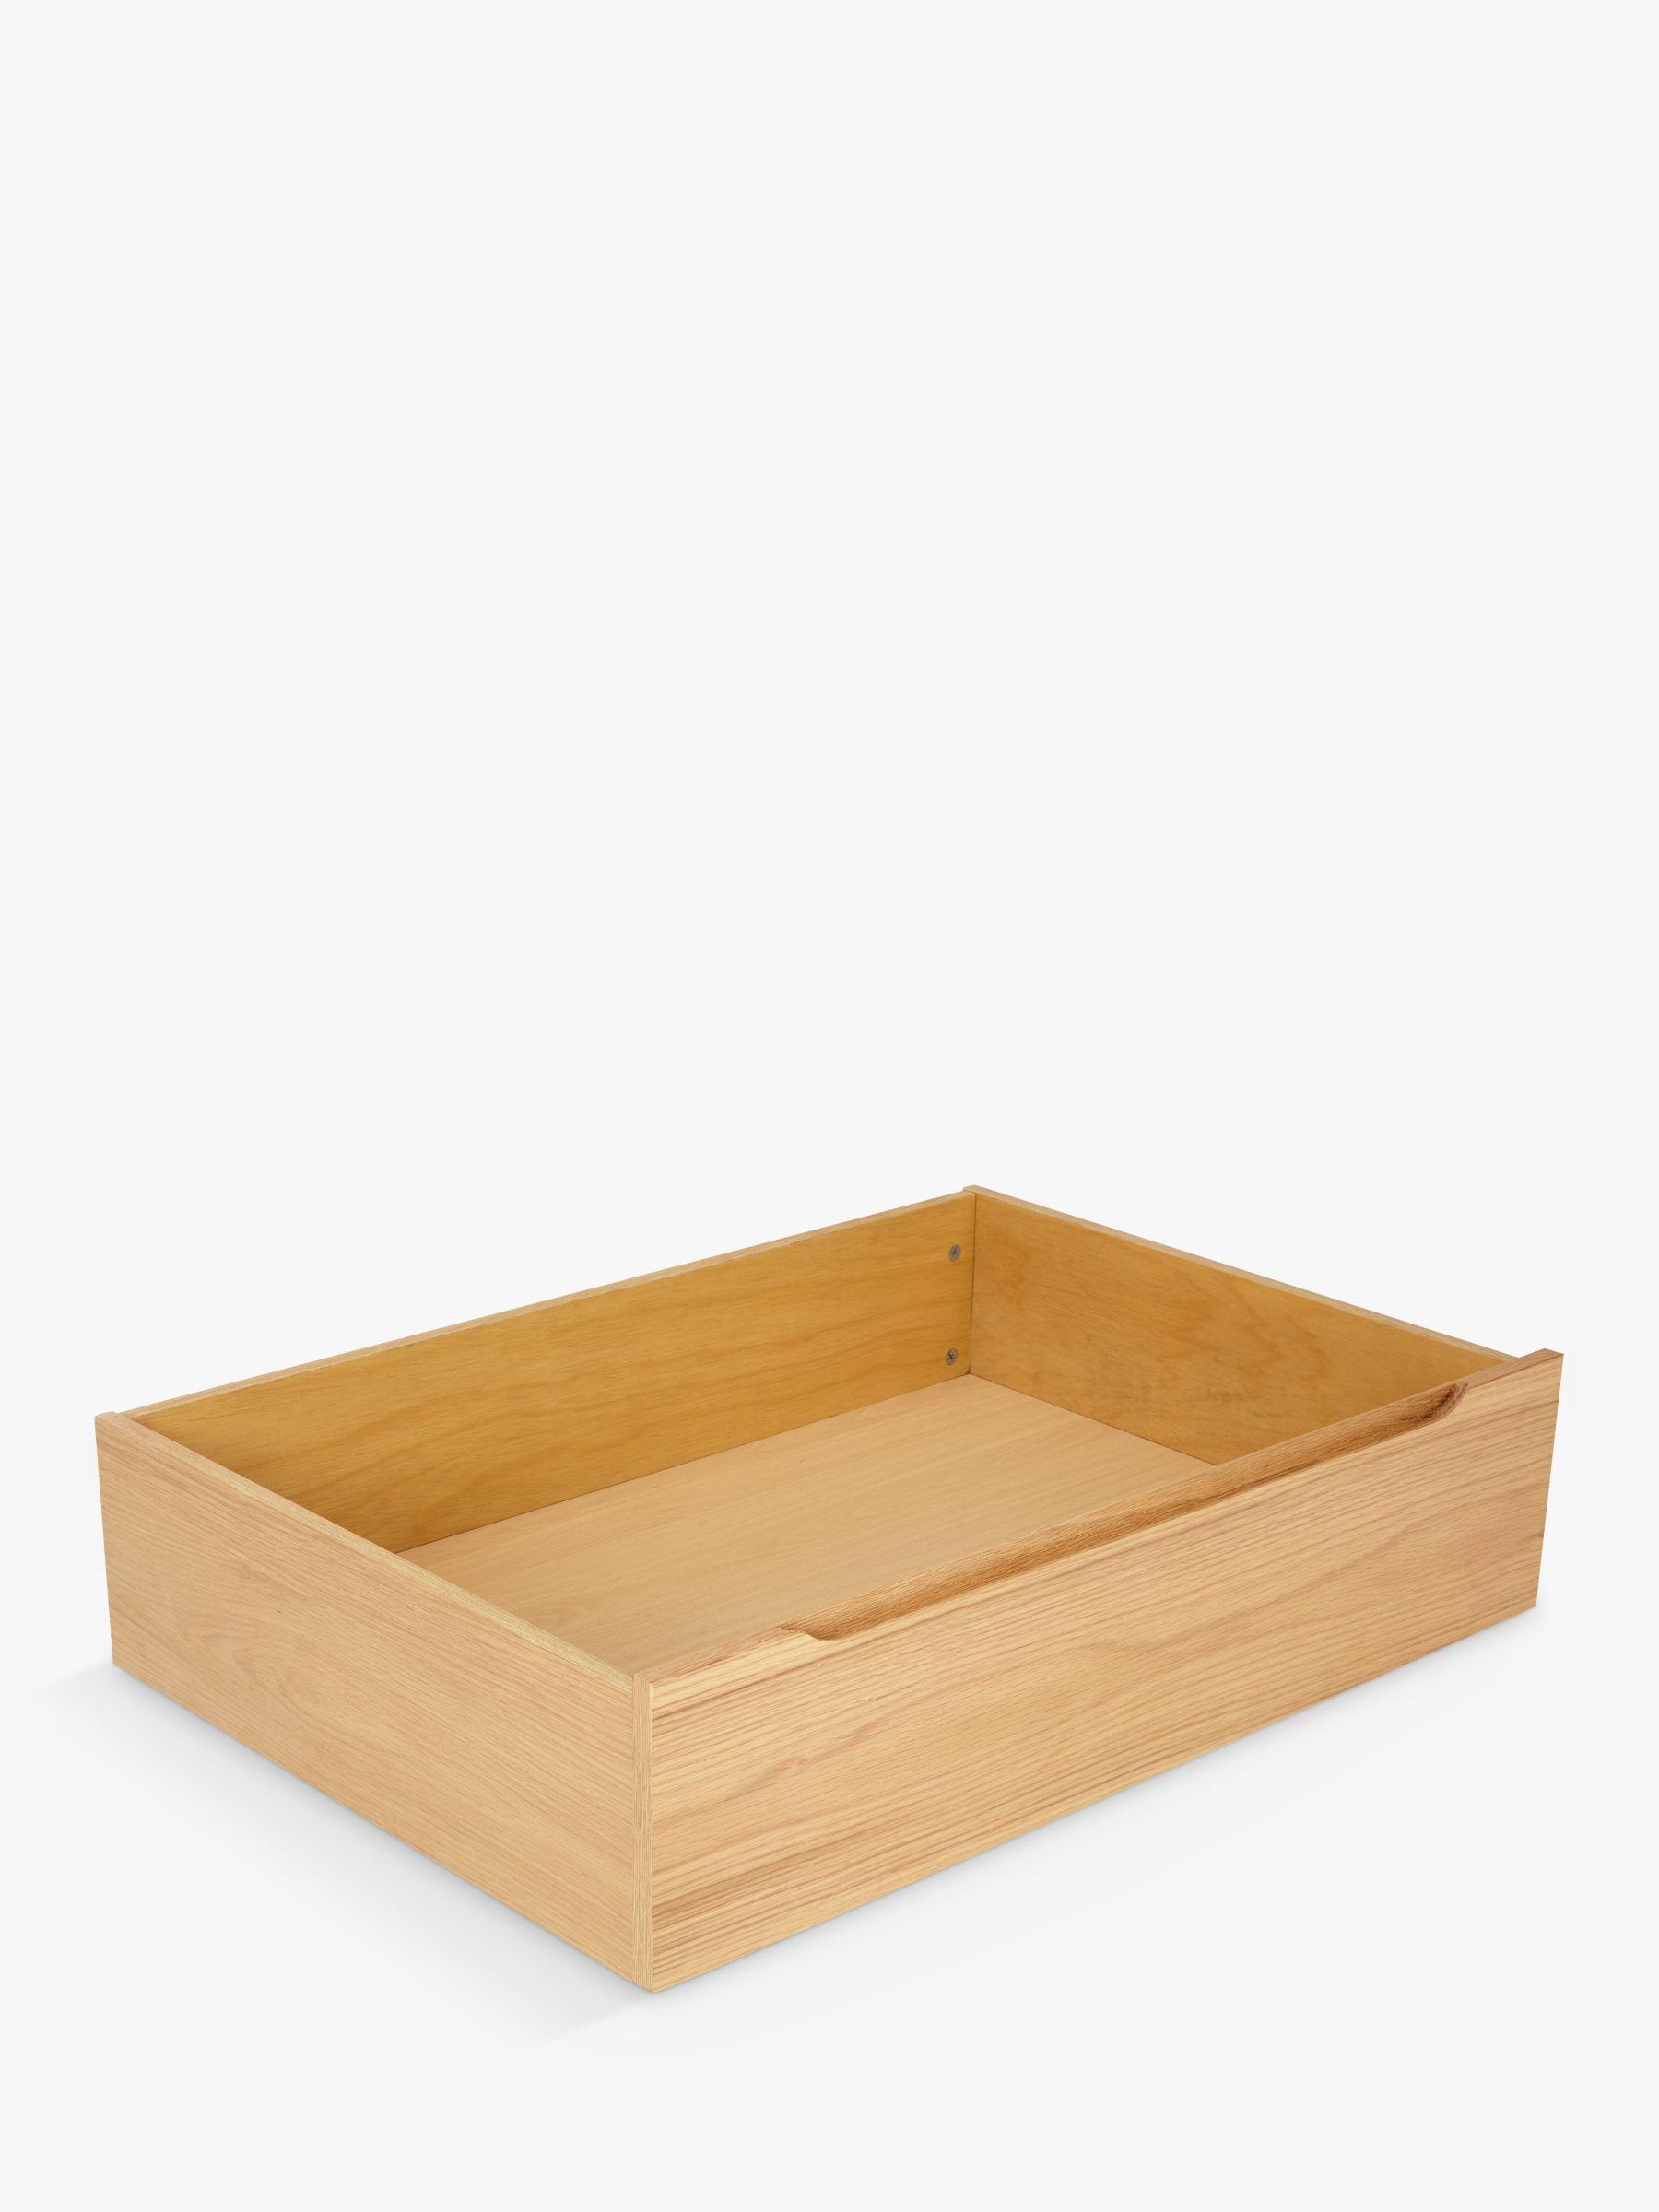 John Lewis & Partners Bow Underbed Storage Drawers, Set of 2